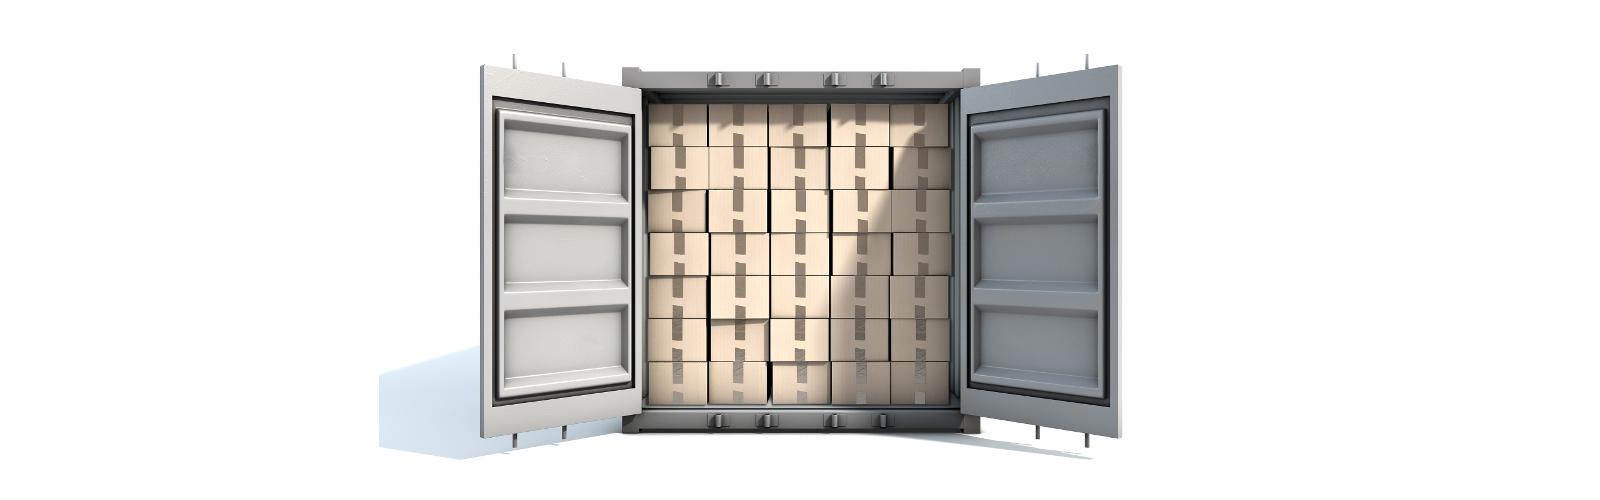 Storage Self Storage In Leicestershire Gilmorton Storage Gilmorton Storage